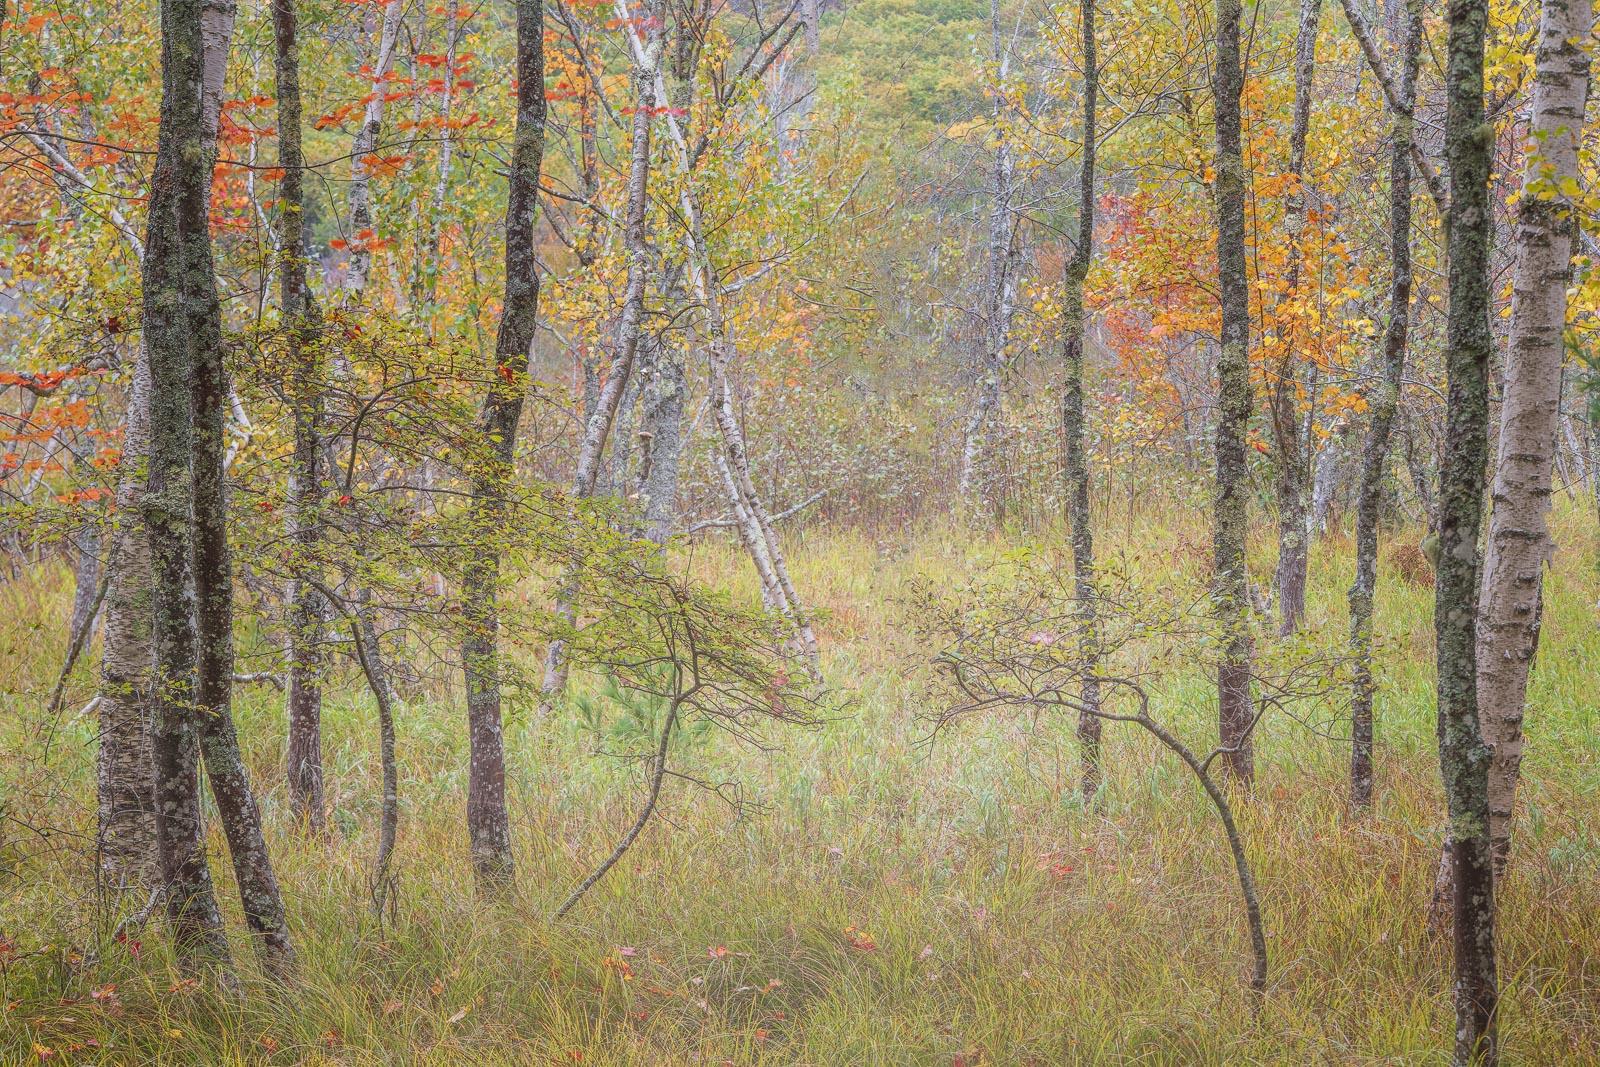 Autumn scene along the Jessup Path, Acadia National Park.